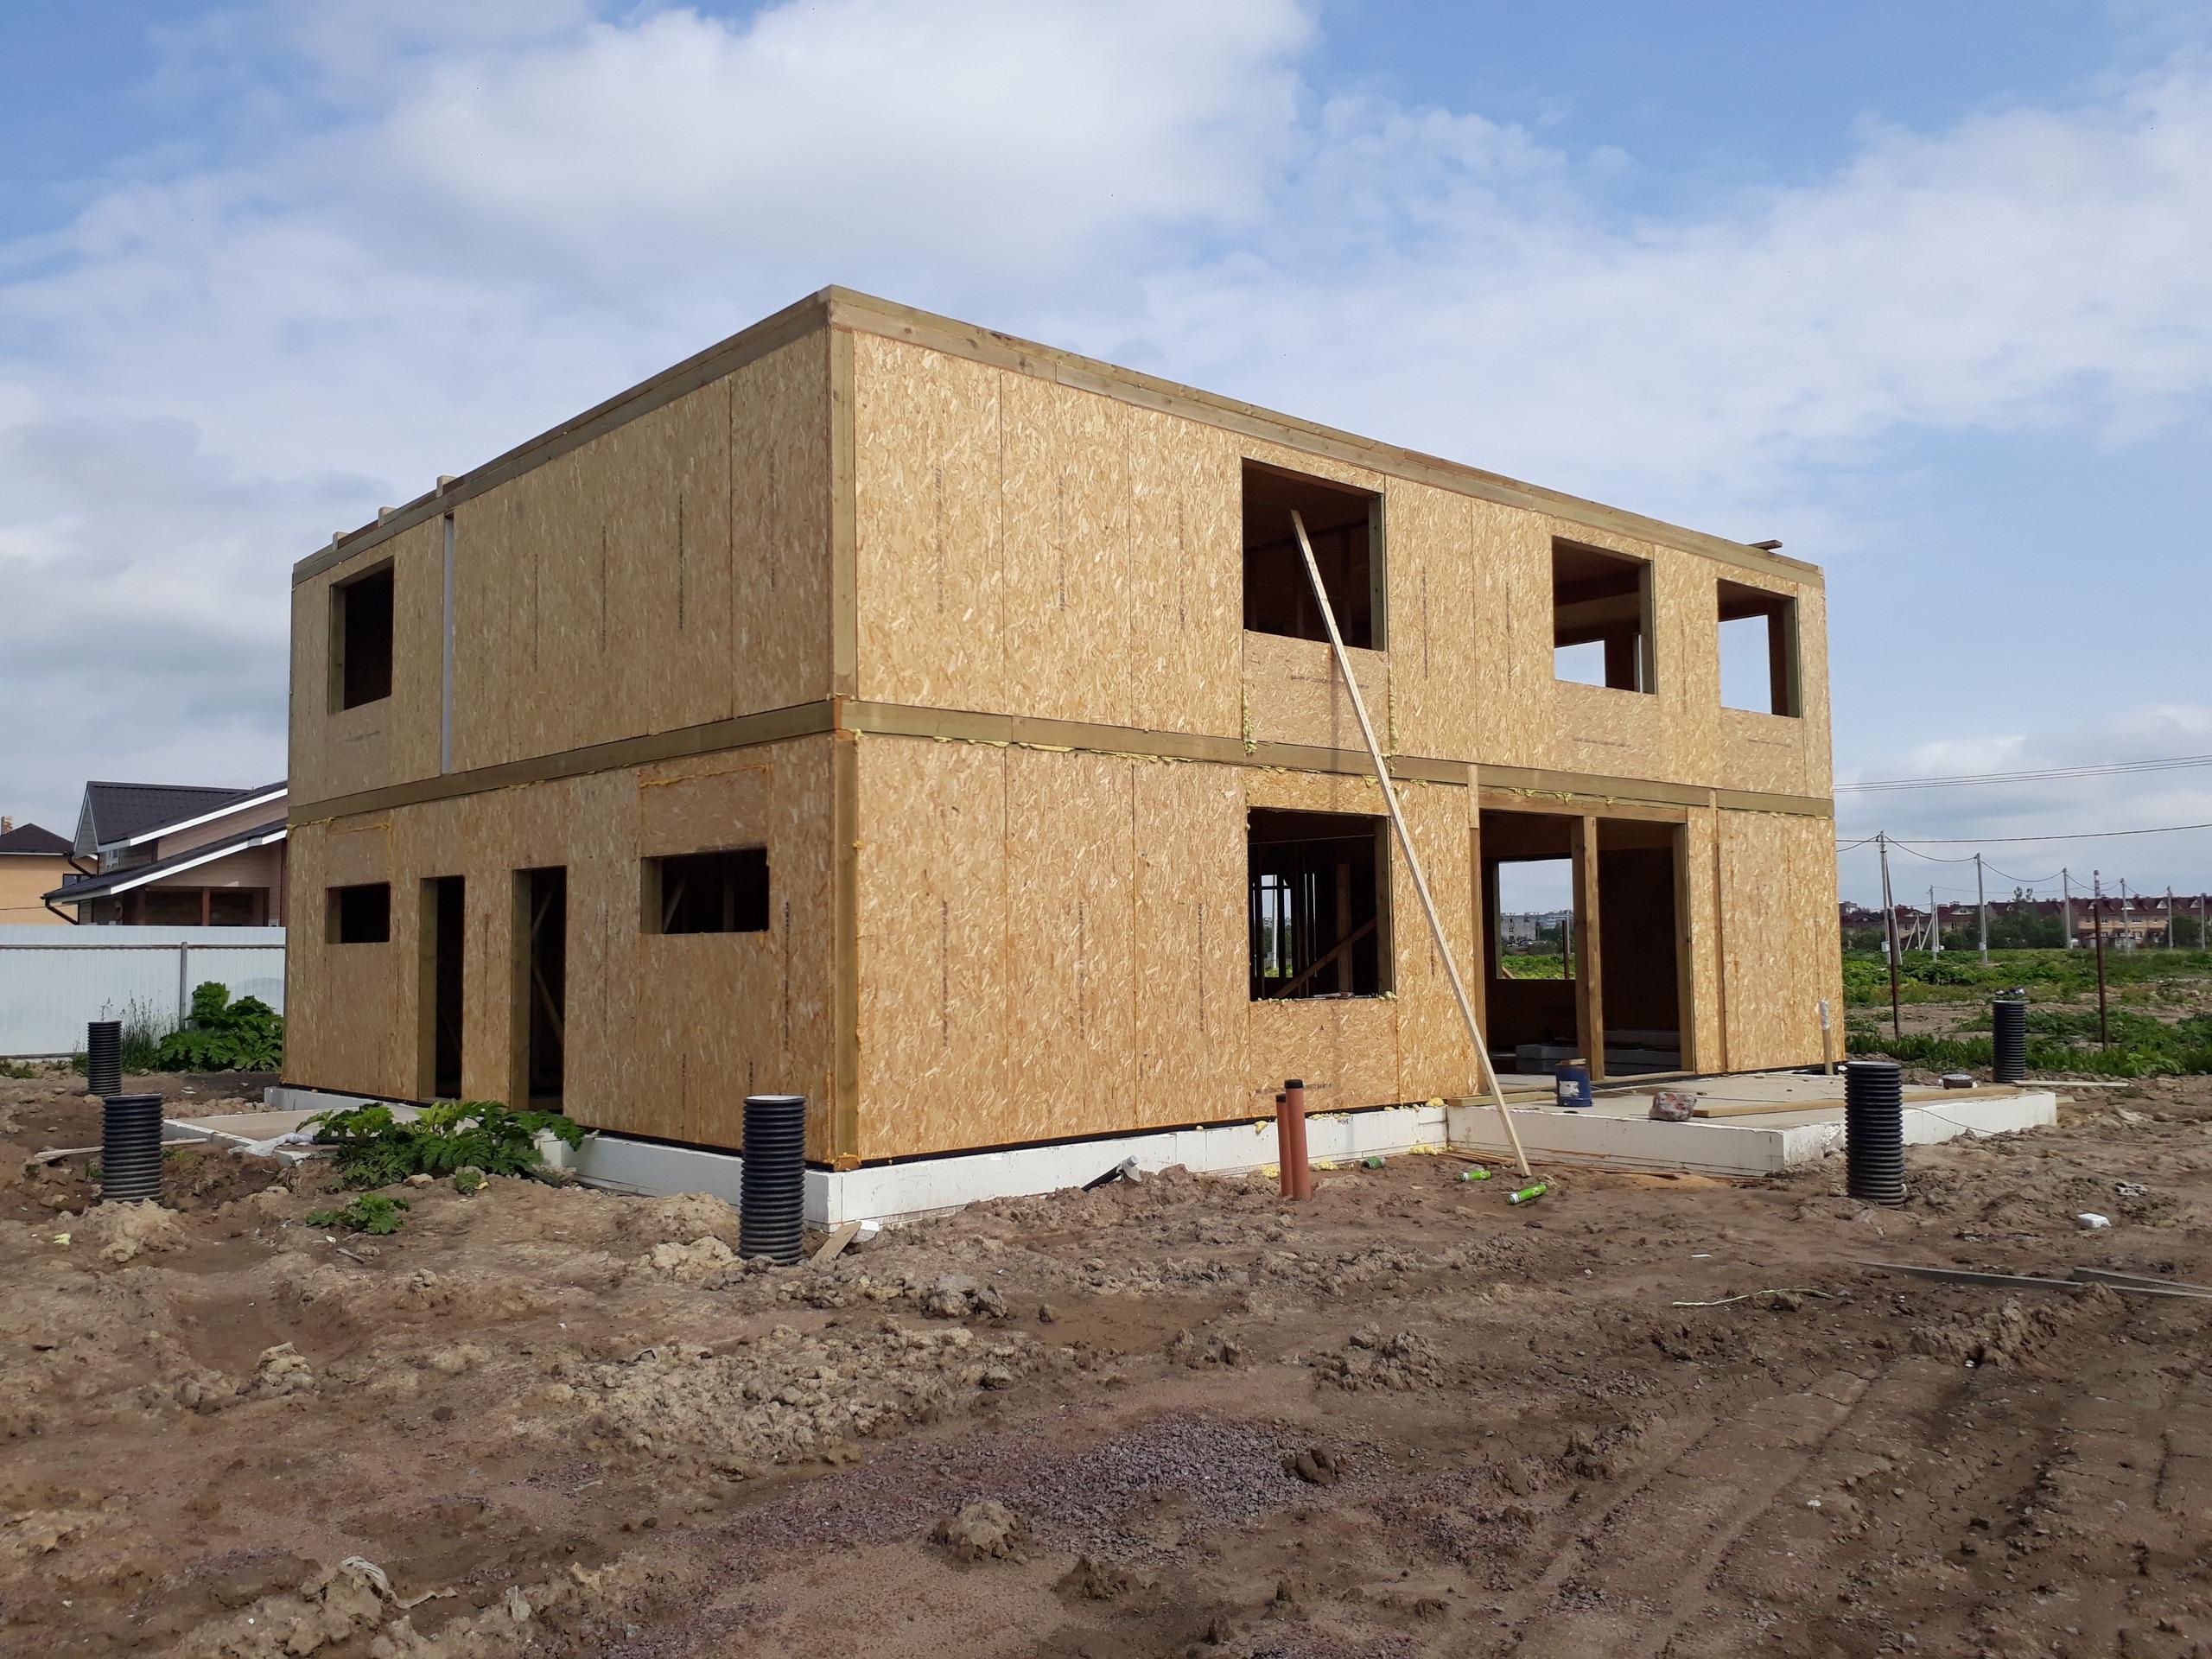 фото дома из сип панелей №2 коммунар